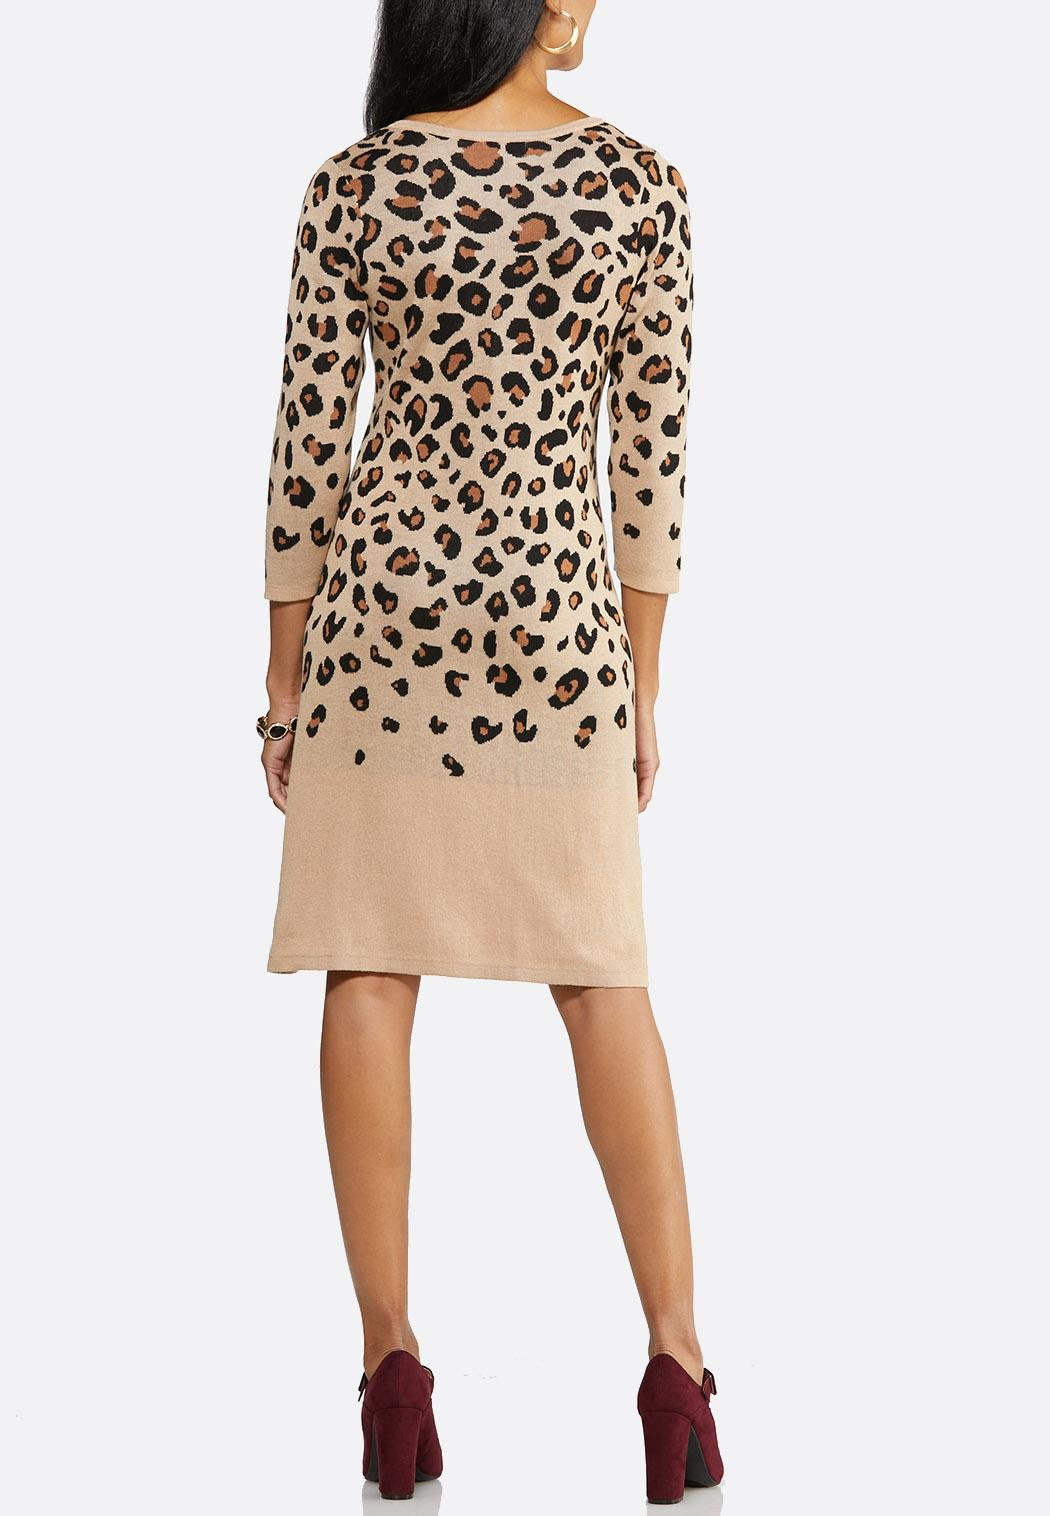 Leopard Sweater Dress (Item #43989811)